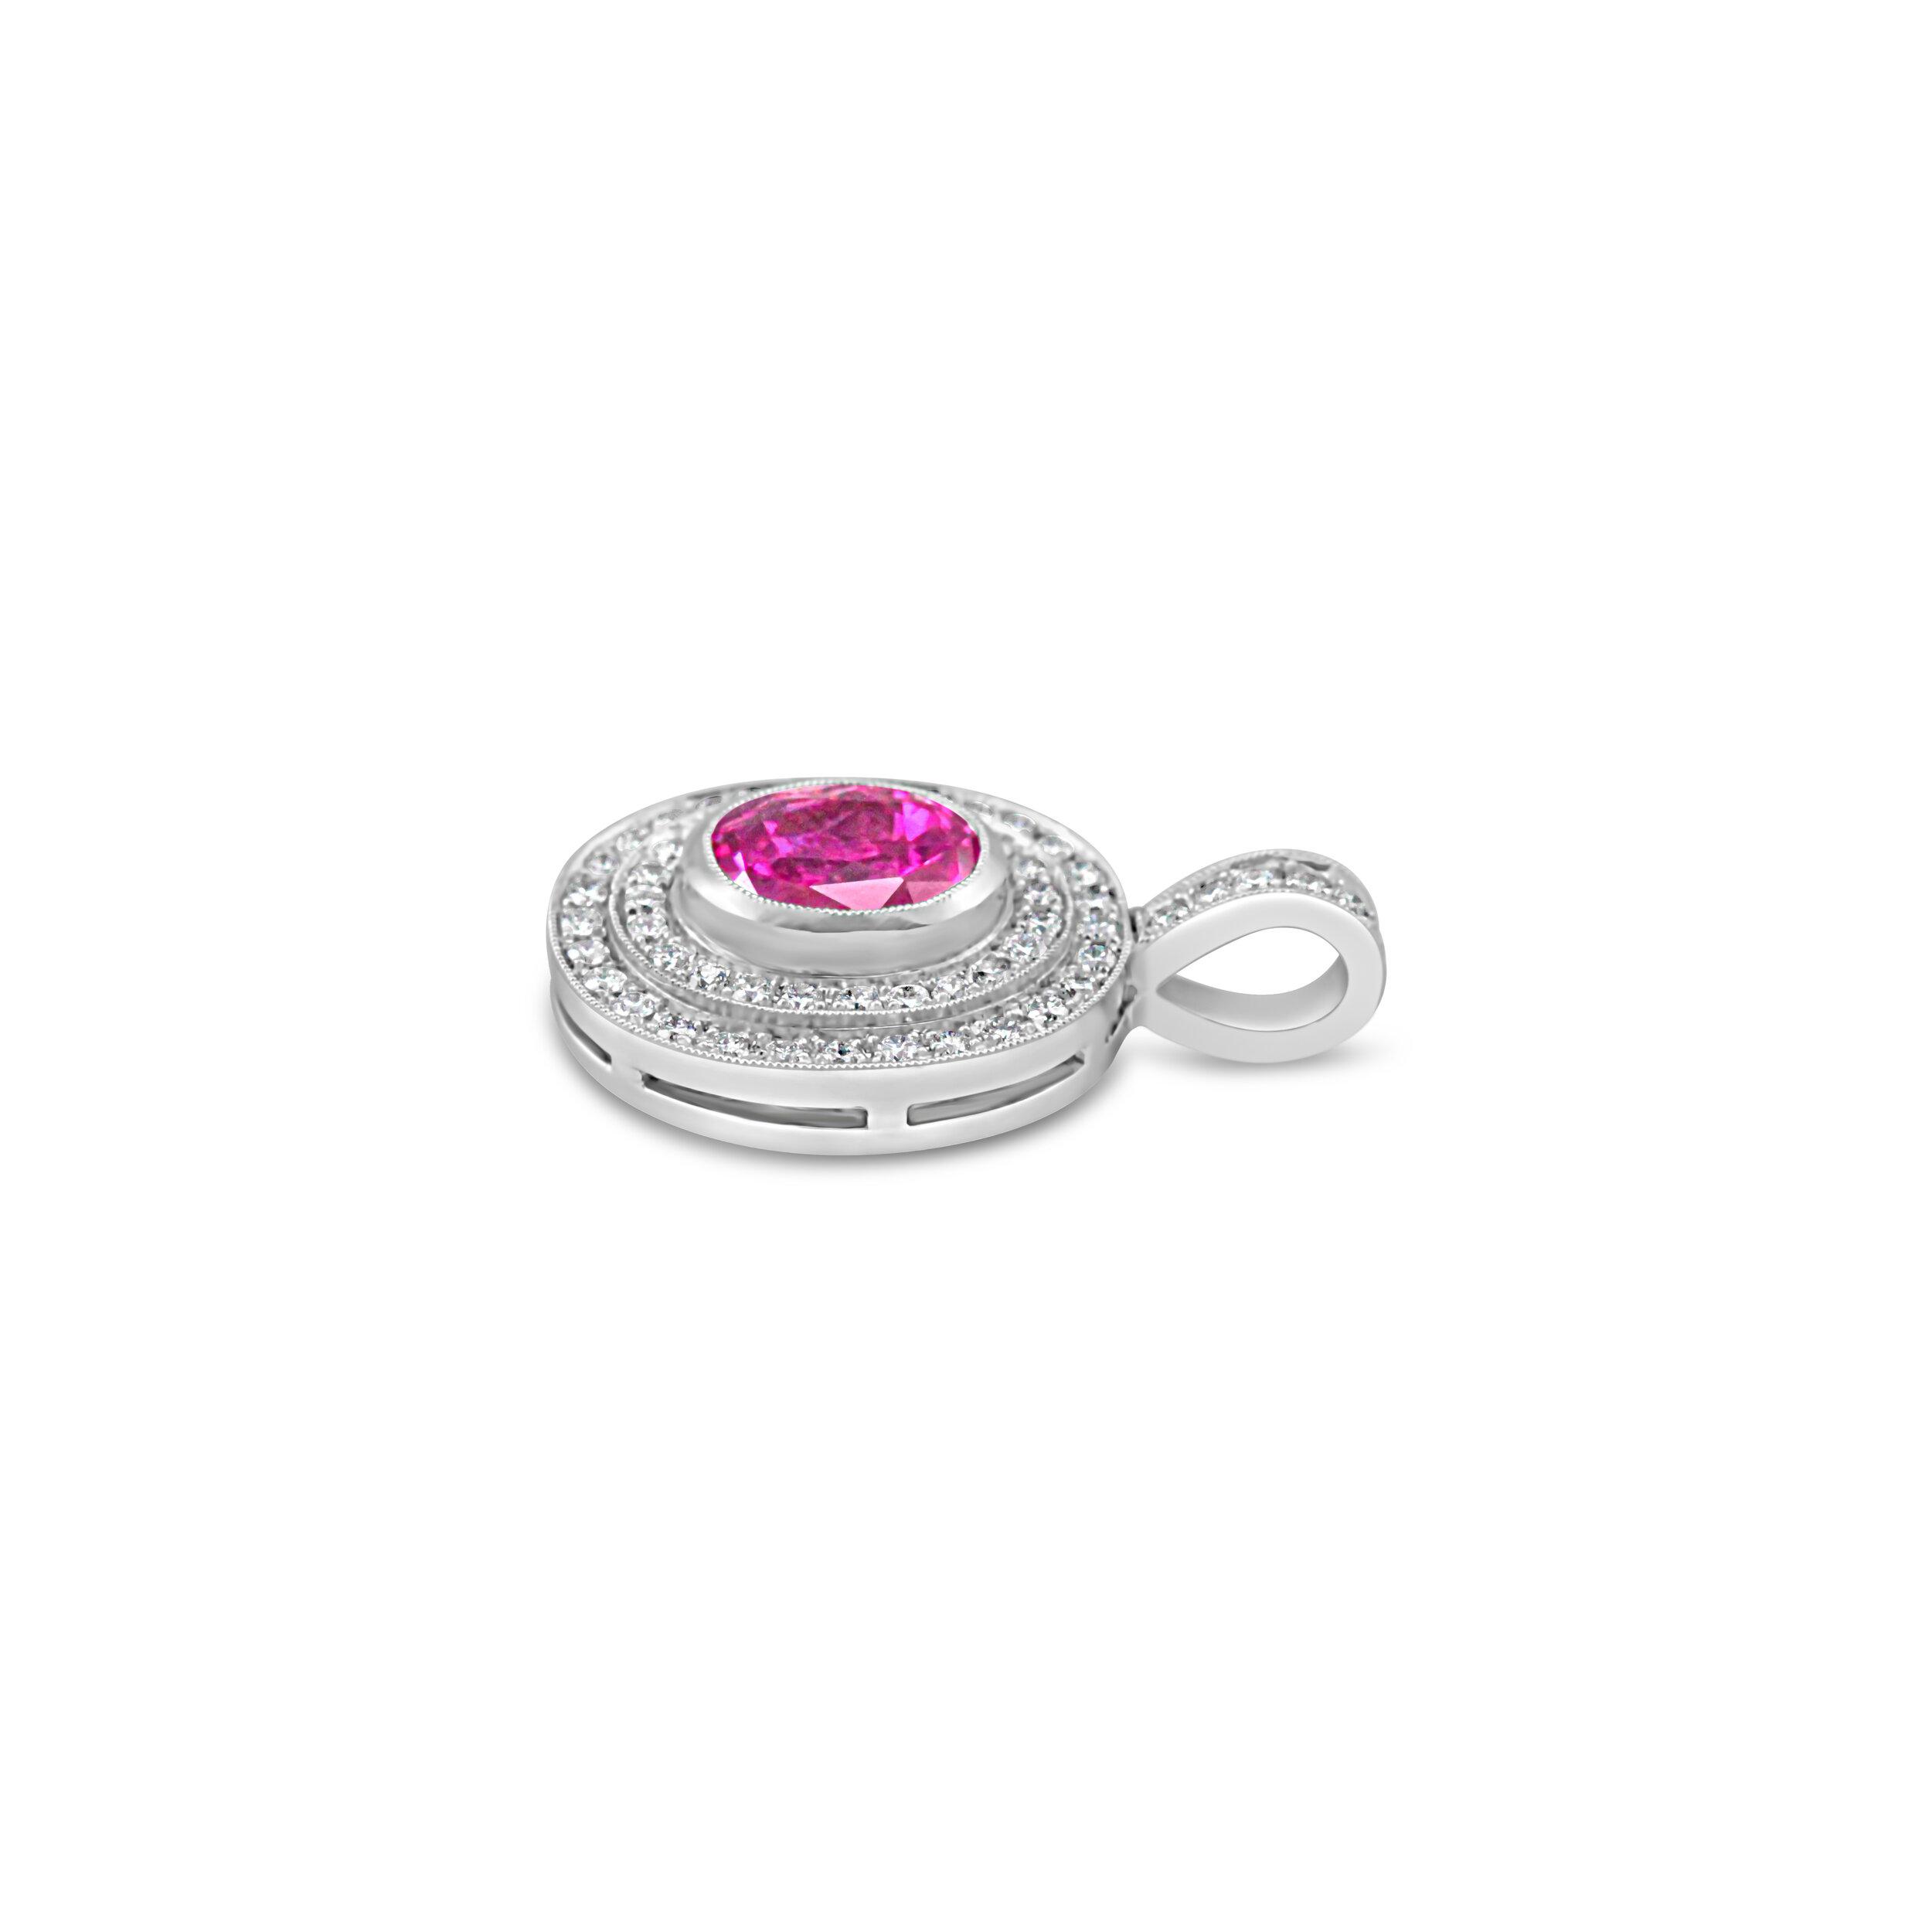 2 ct pink sapphire side.jpg